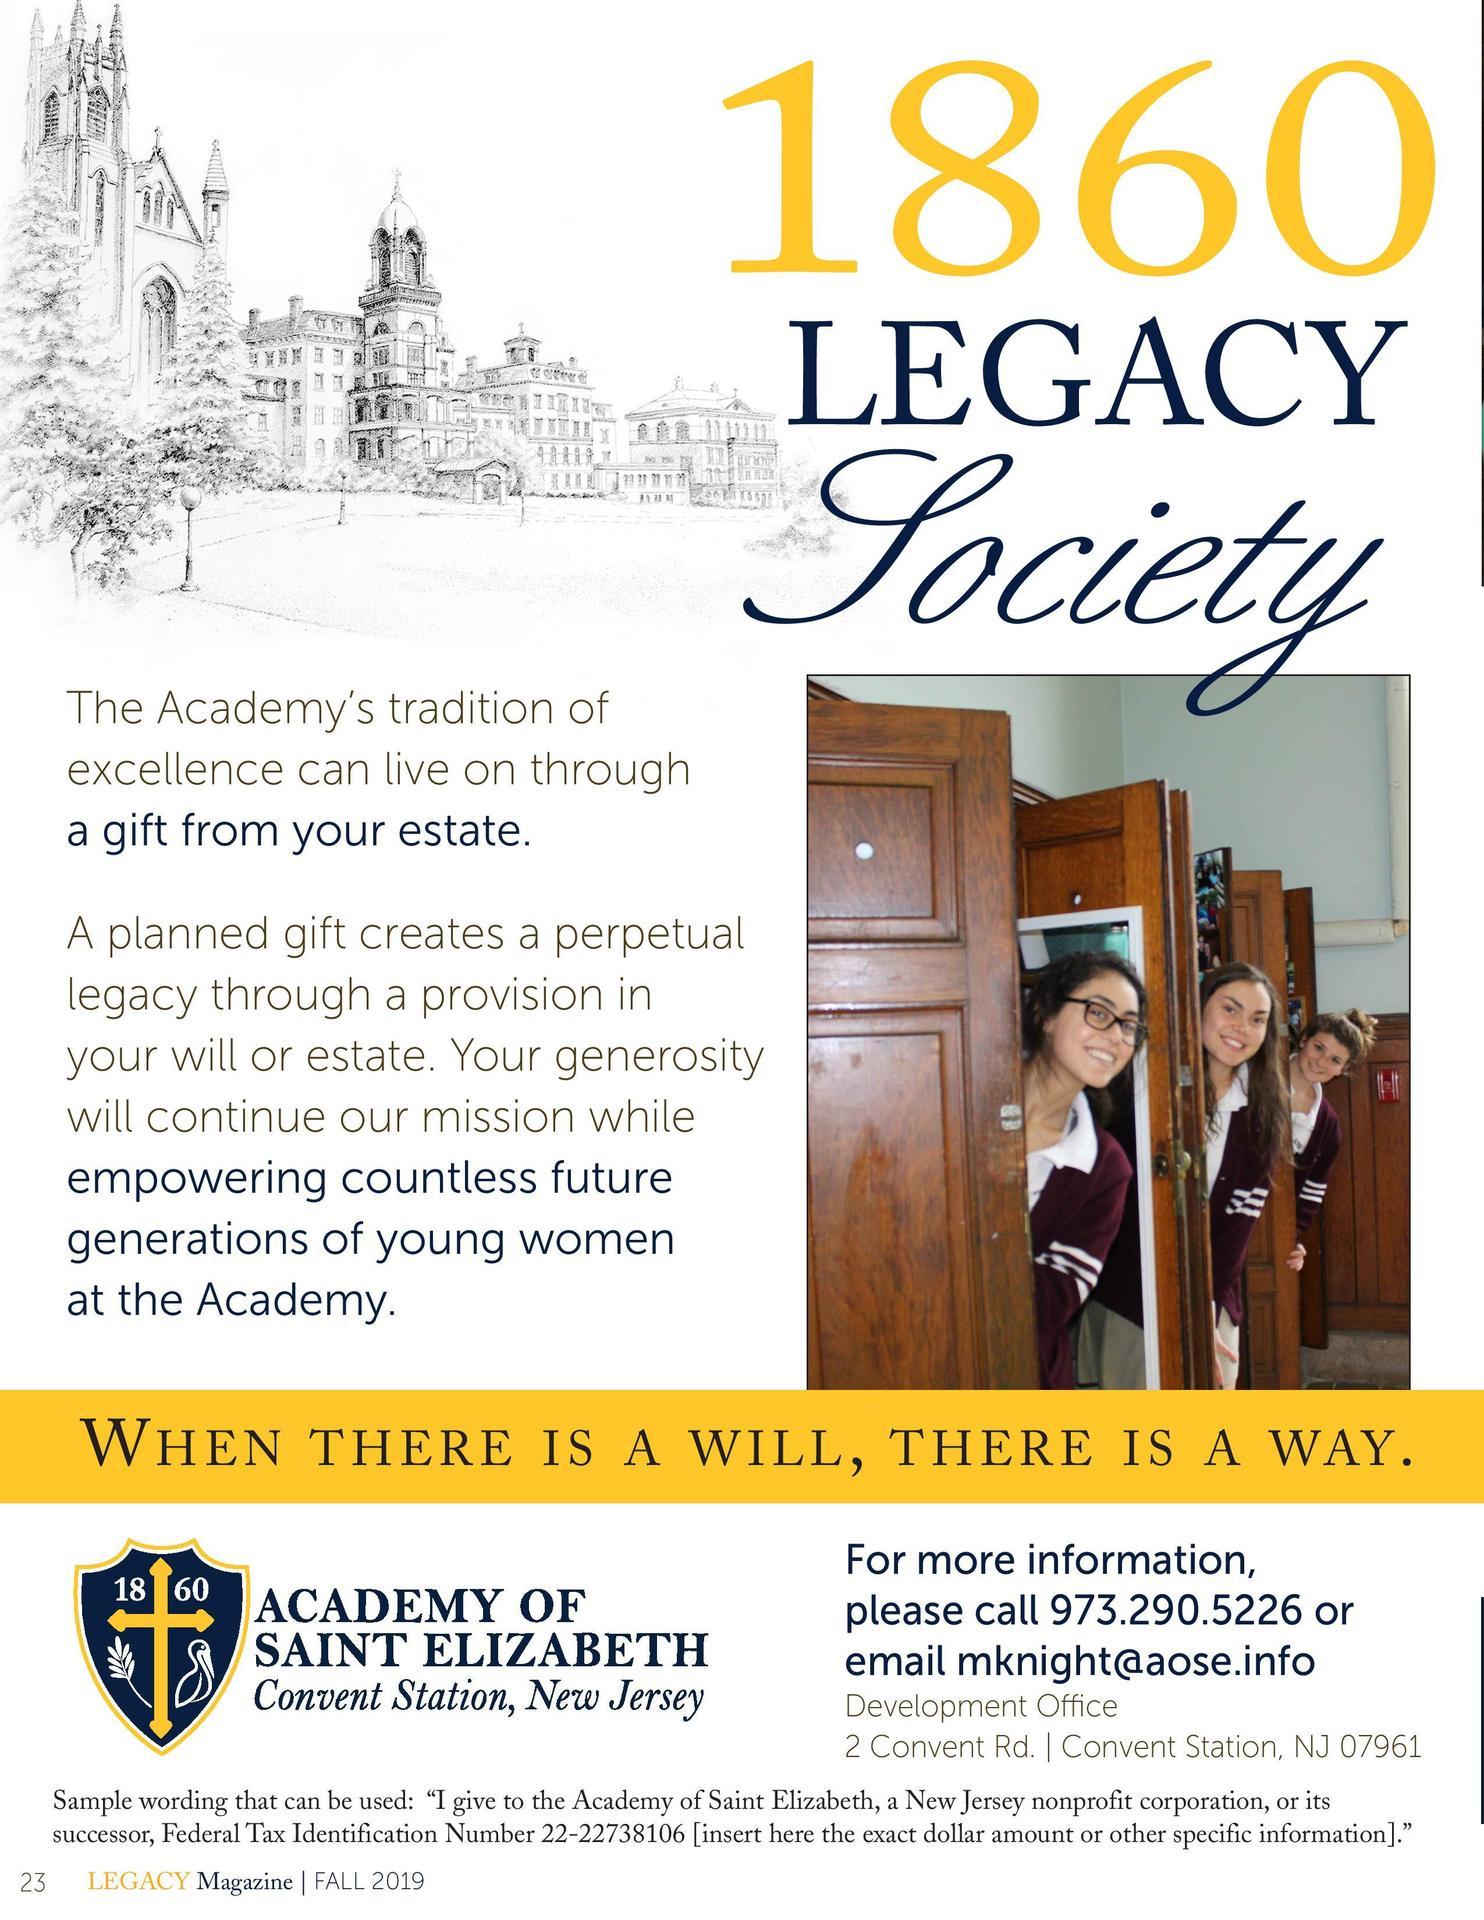 1860 Legacy Society